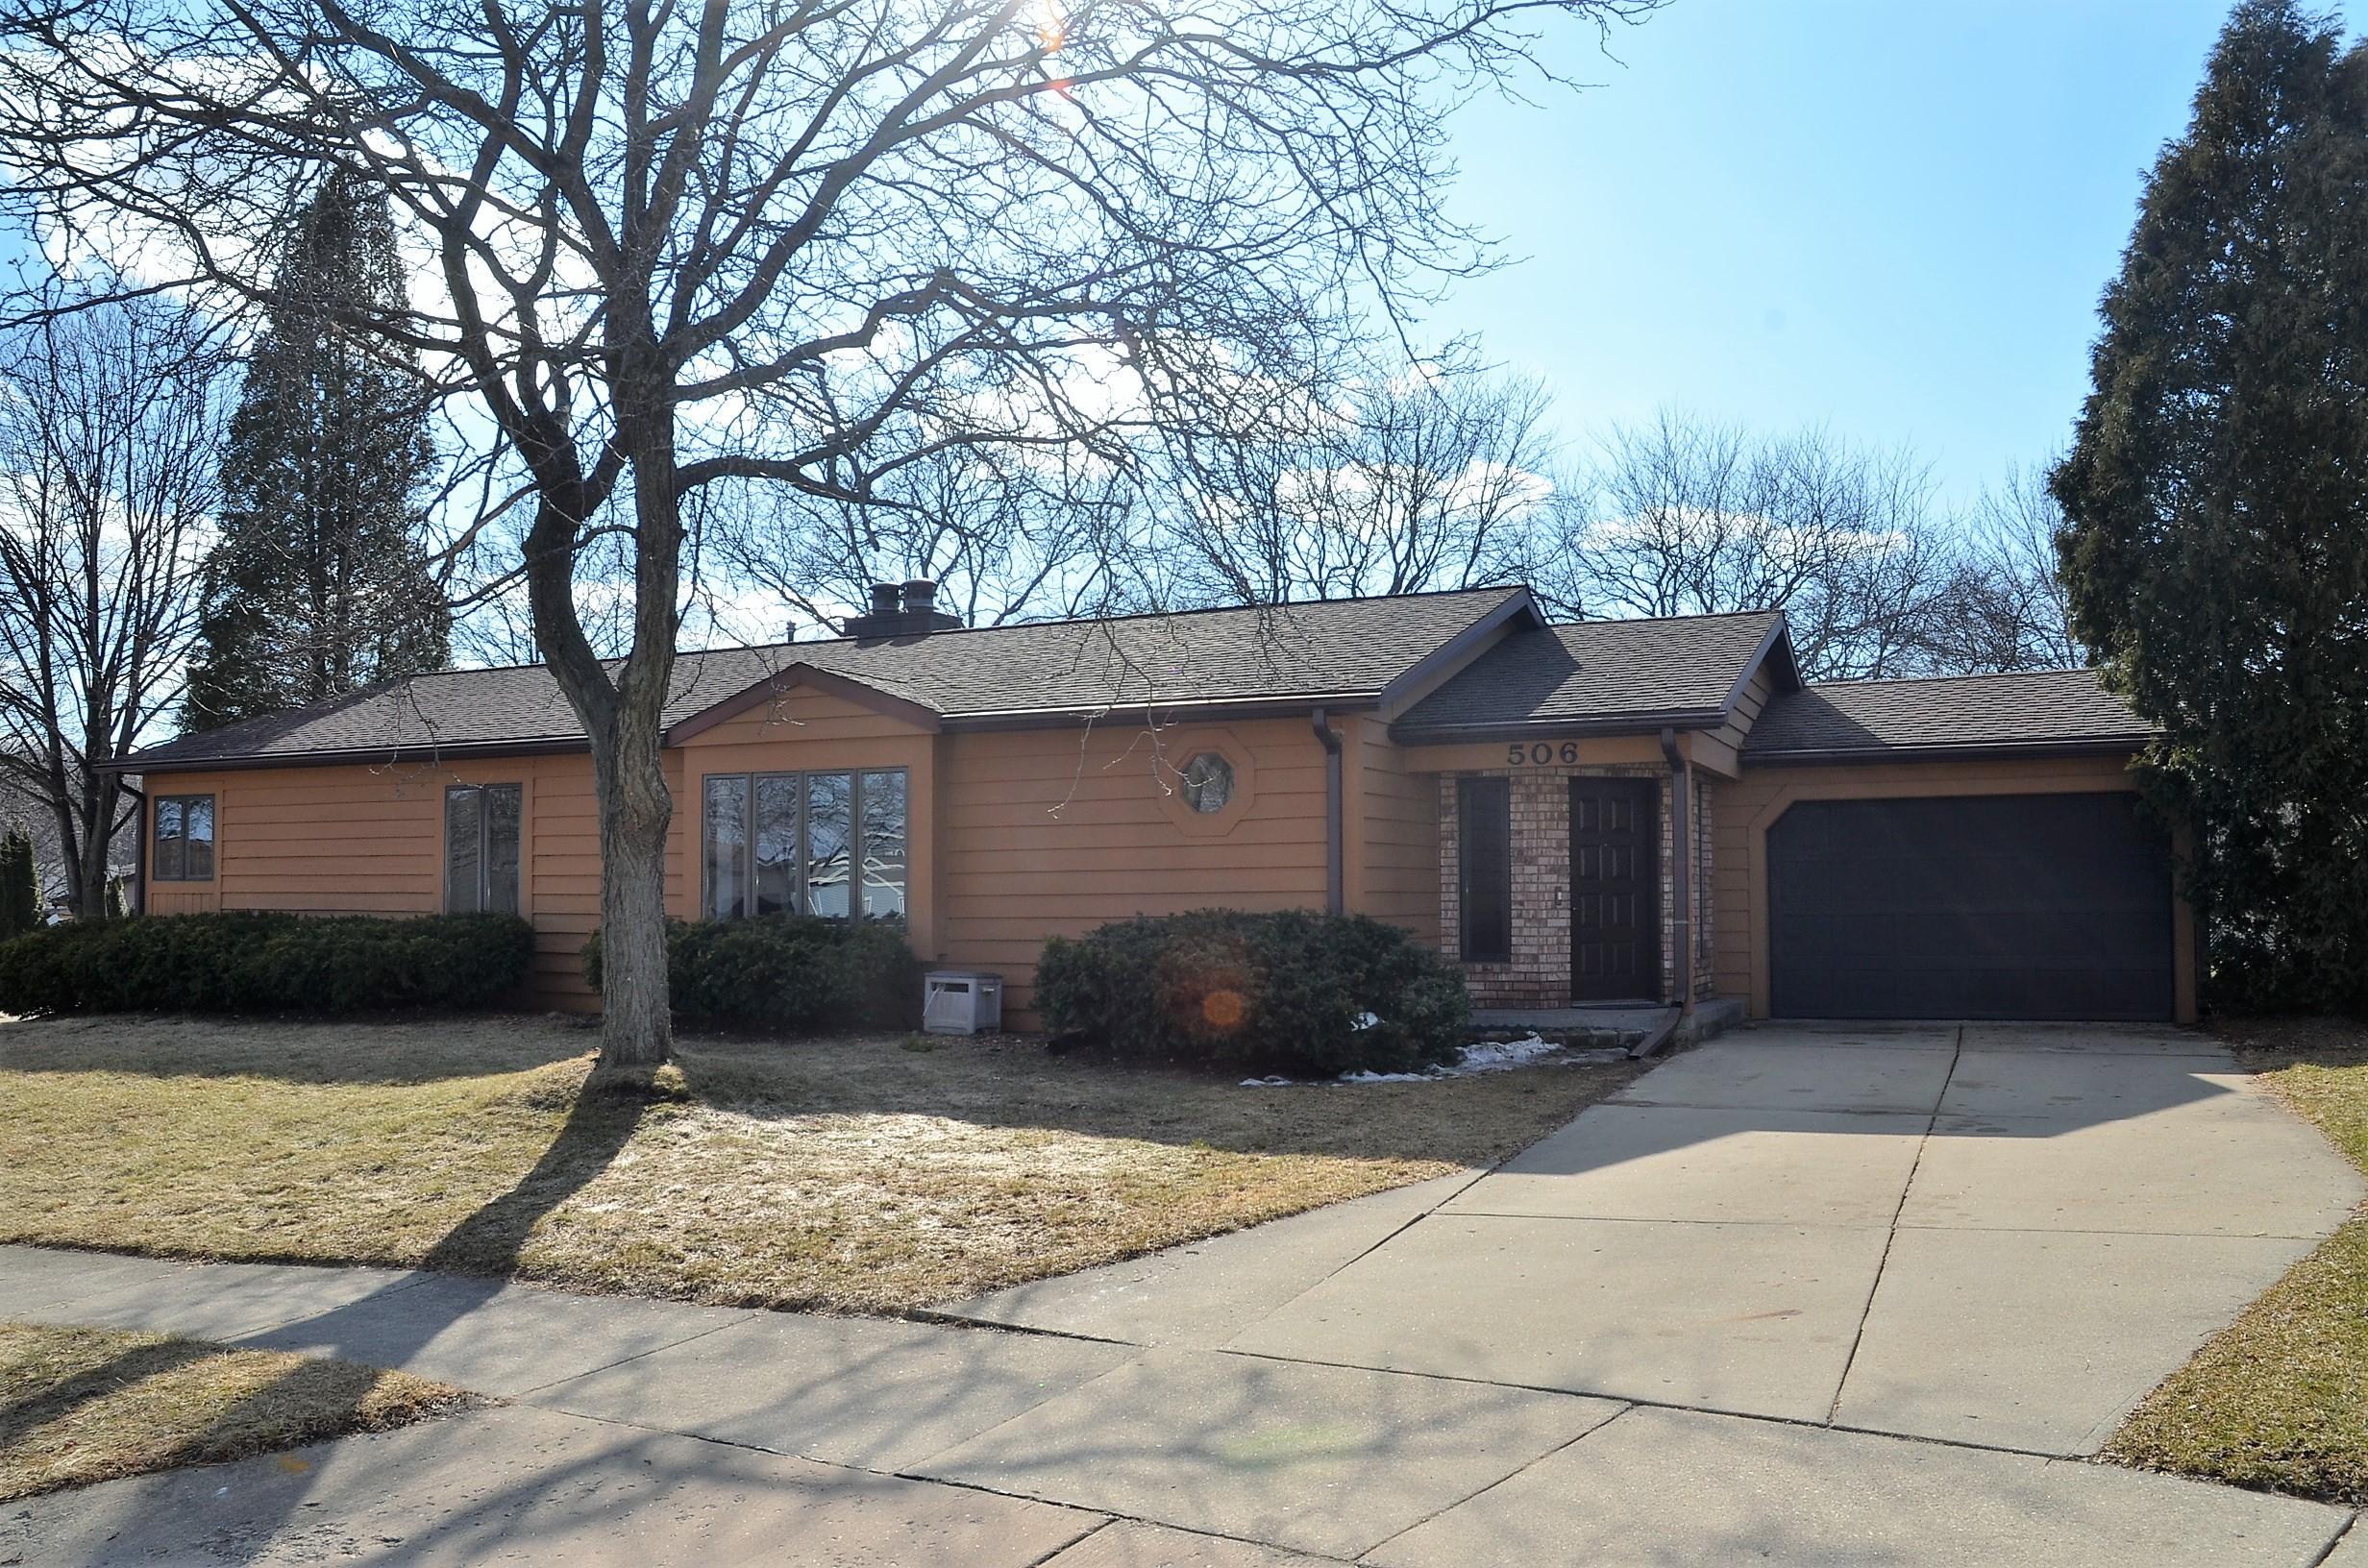 506 Mabel Ct, Waukesha, Wisconsin 53188, 3 Bedrooms Bedrooms, 9 Rooms Rooms,2 BathroomsBathrooms,Single-Family,For Sale,Mabel Ct,1627564